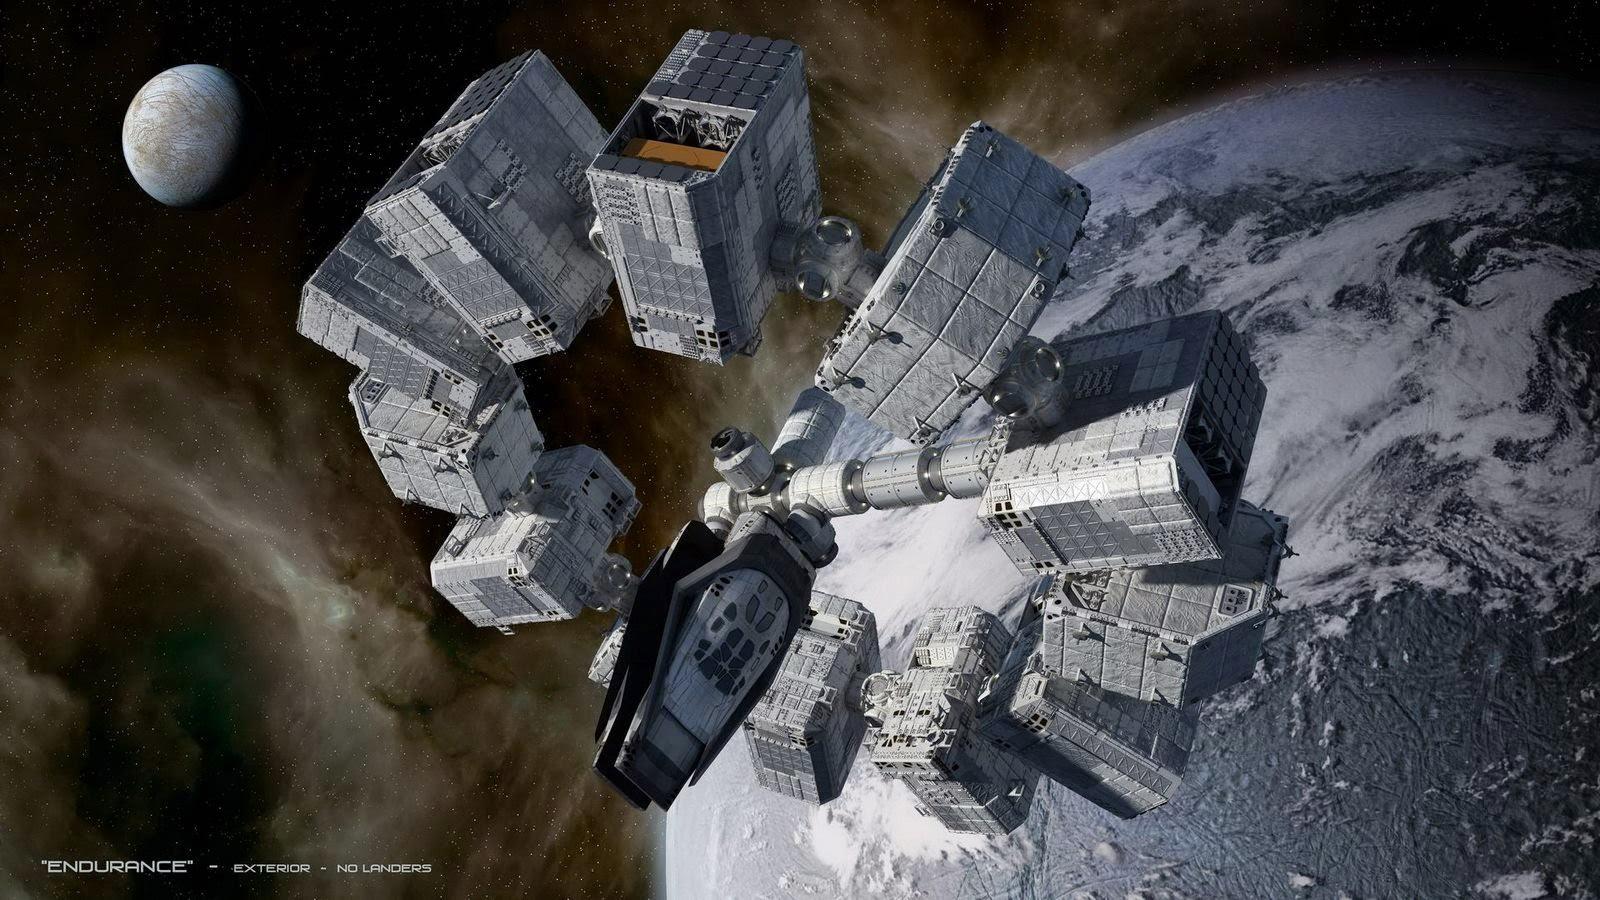 Soaring INTERSTELLAR Spaceship Concept Art by Steve Burg ...